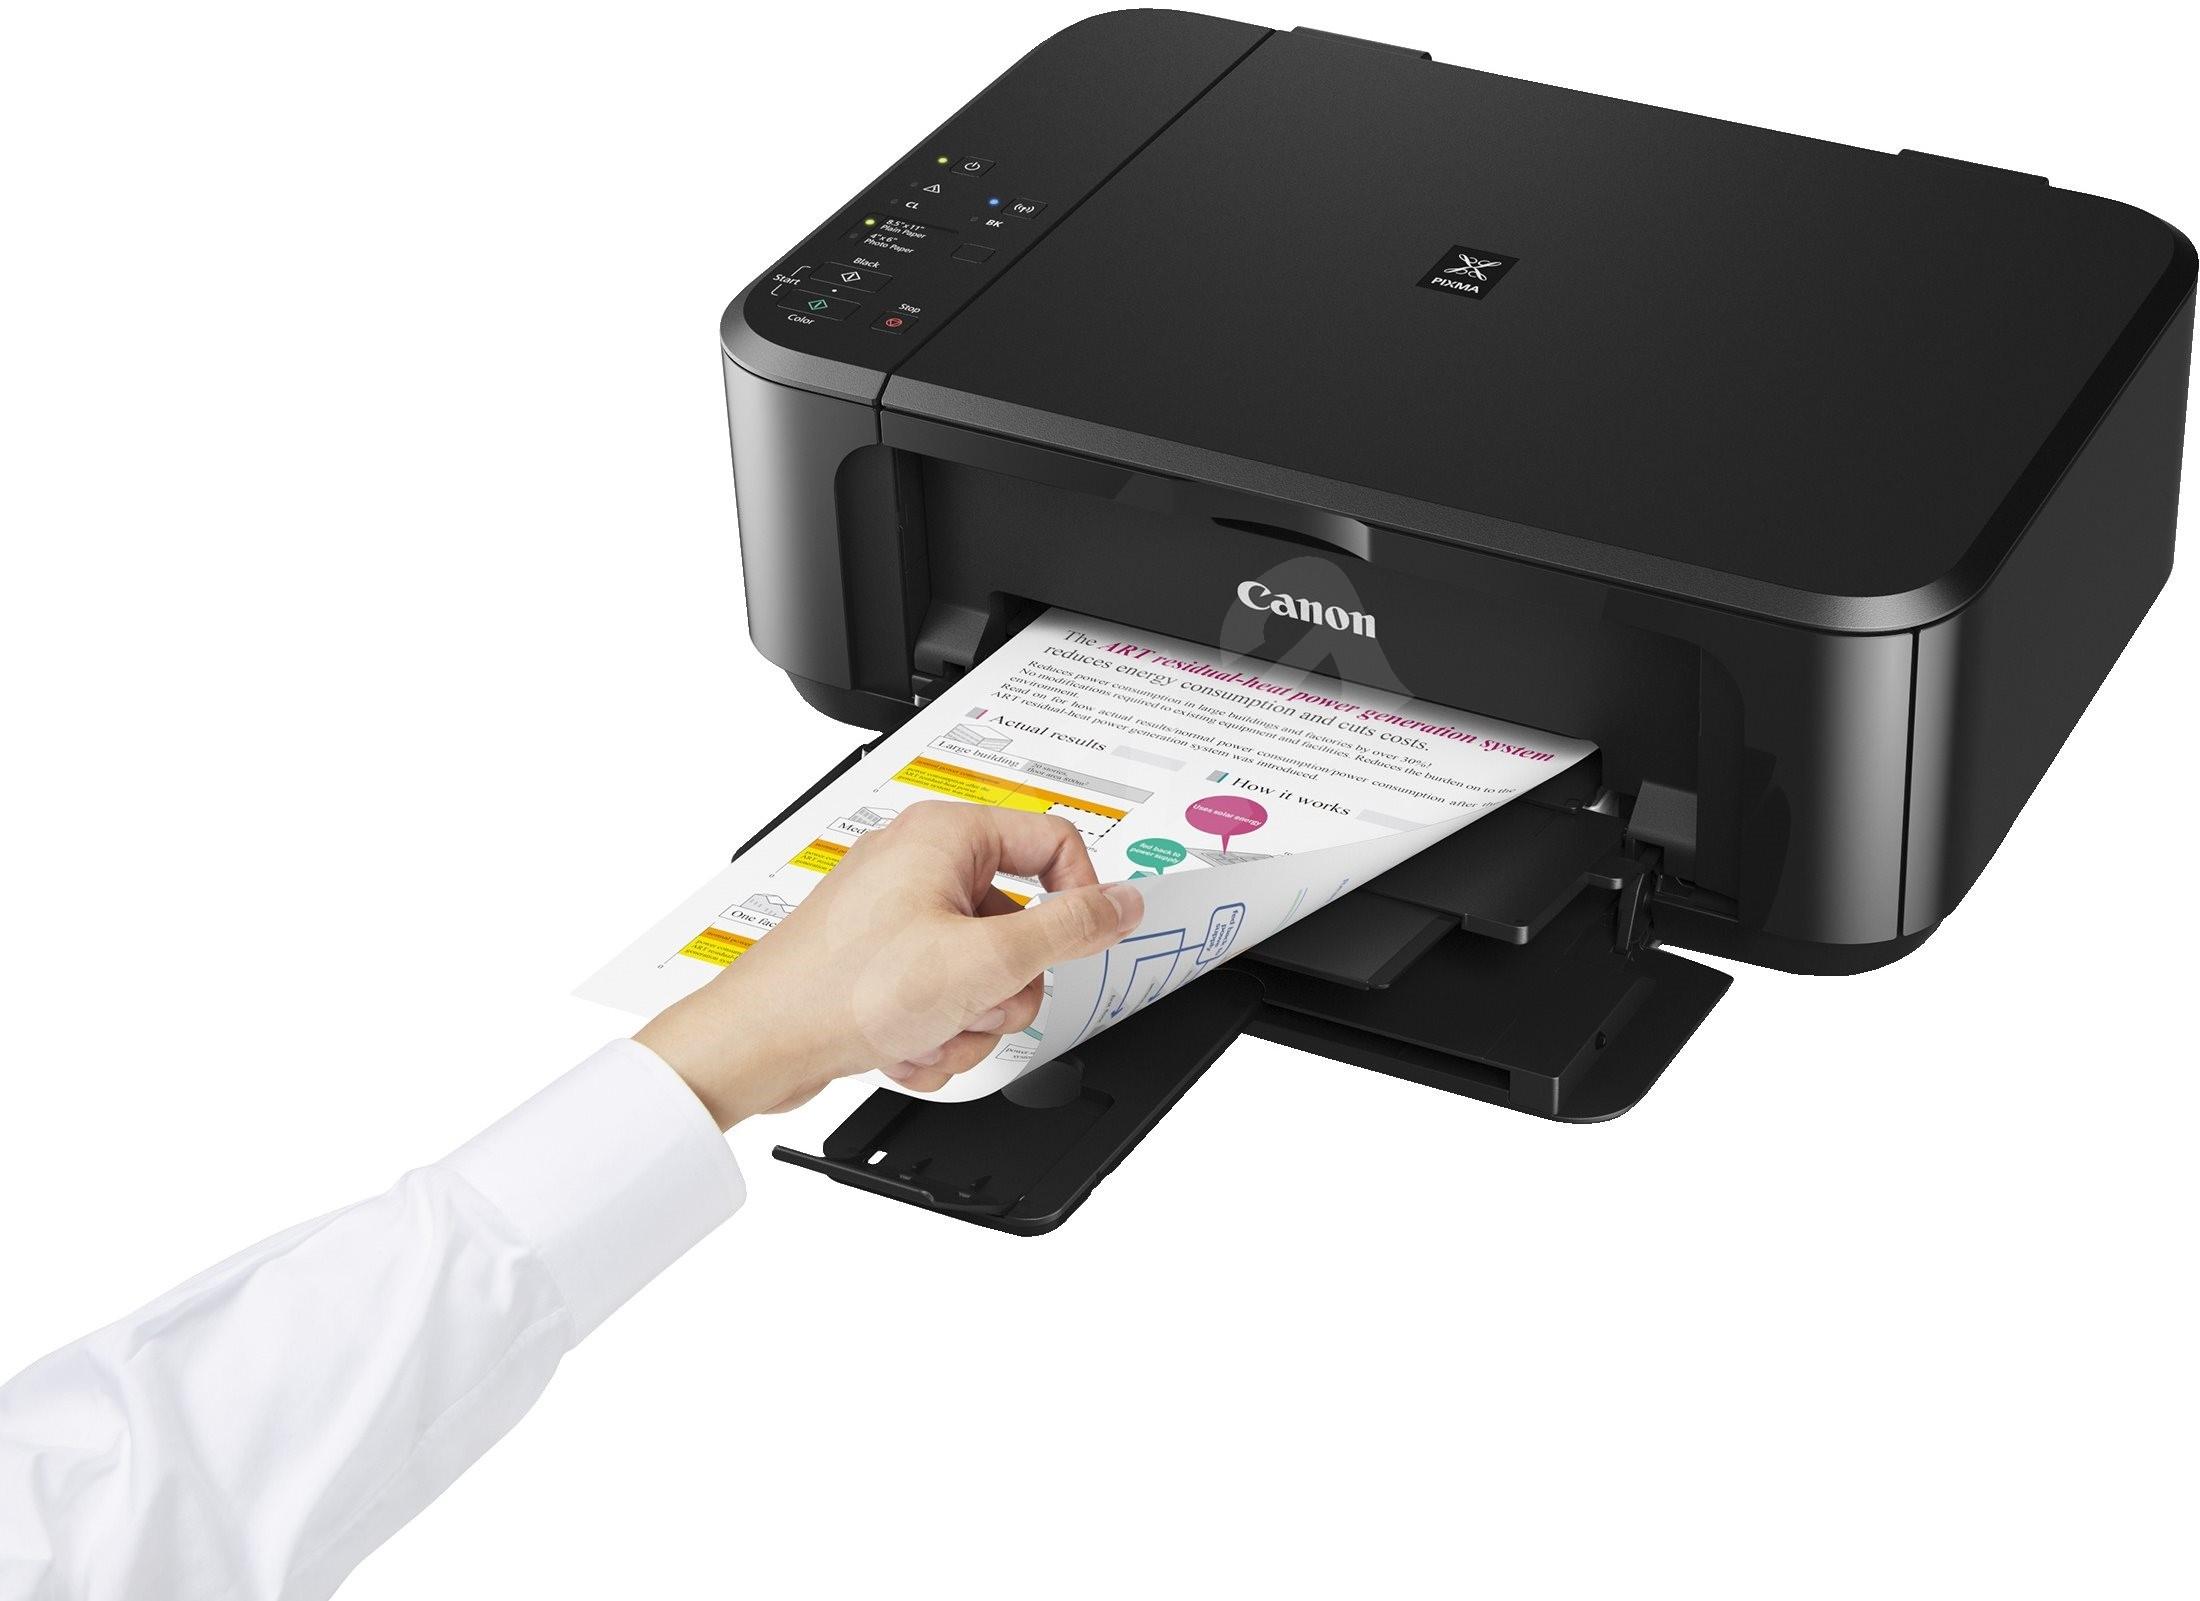 canon pixma mg3650 black inkjet printer. Black Bedroom Furniture Sets. Home Design Ideas